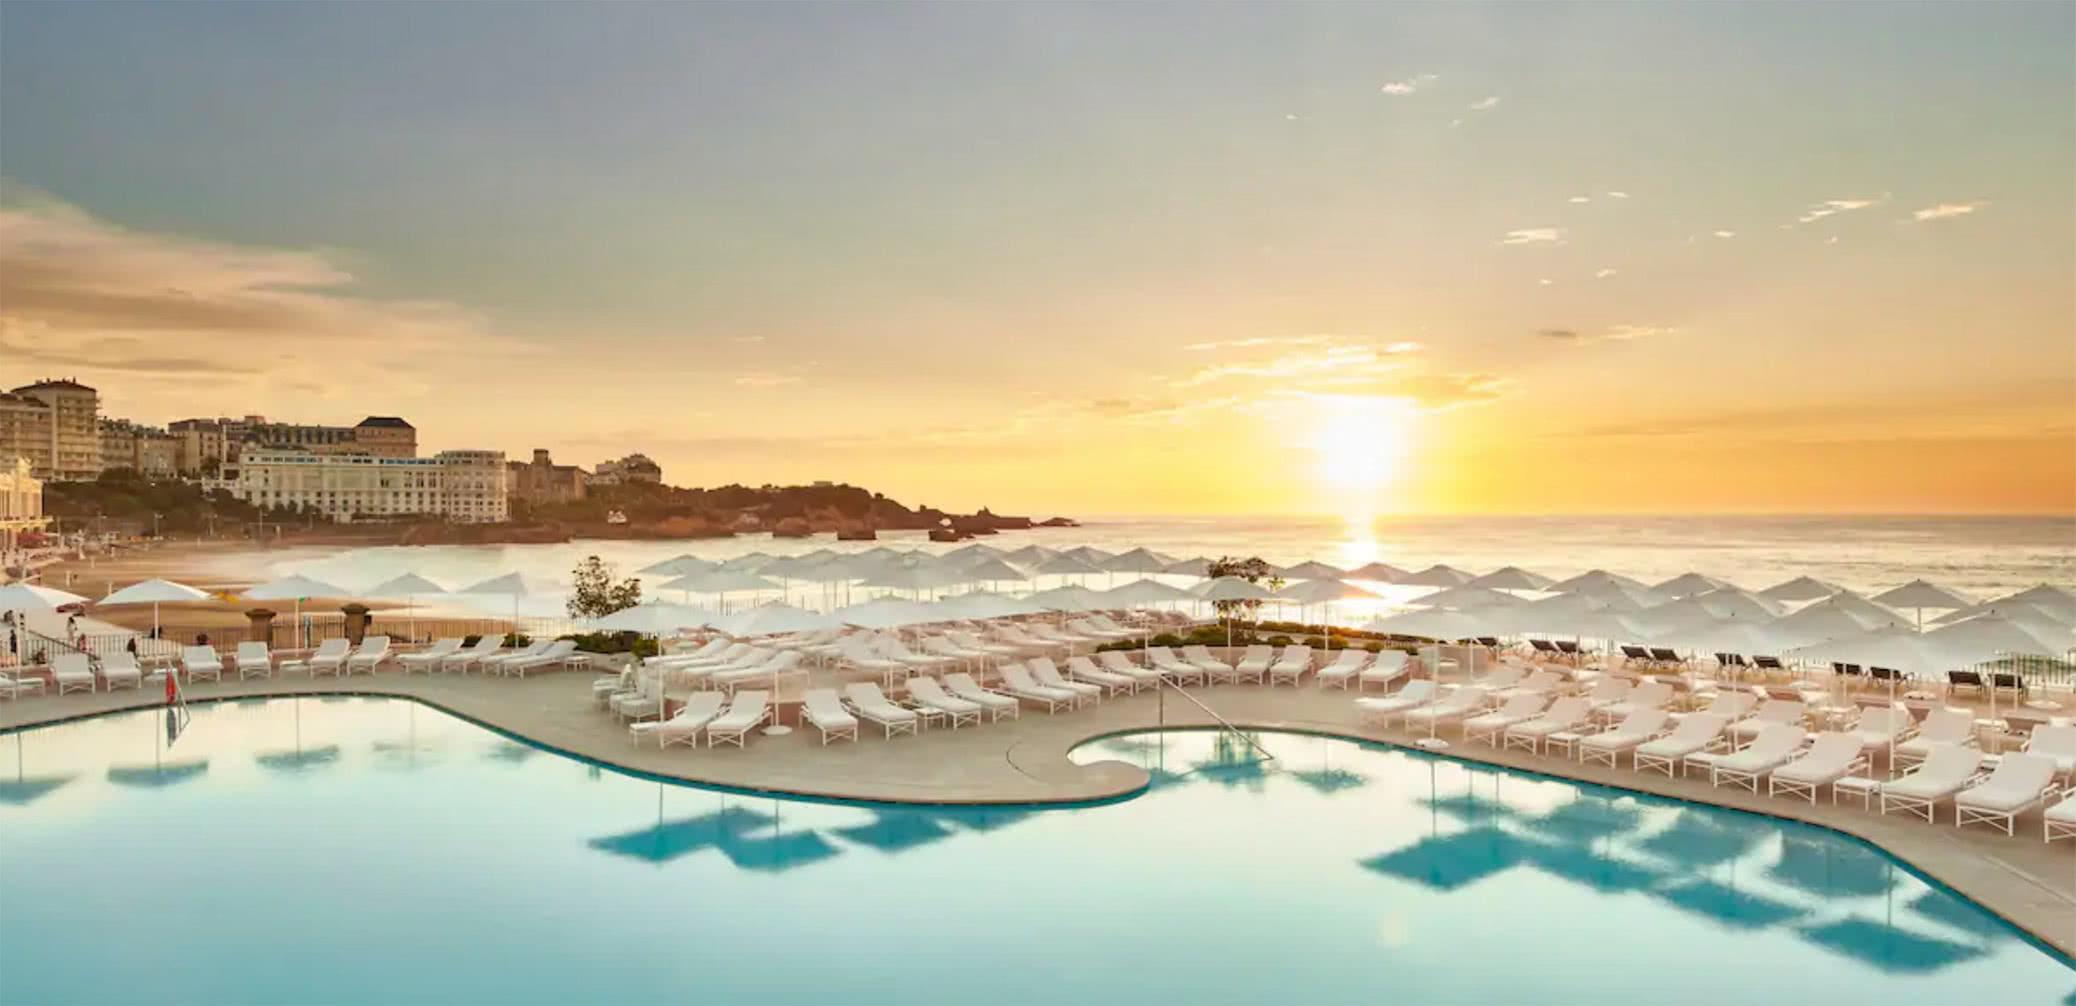 10 Best Hyatt Beach Resorts In The World